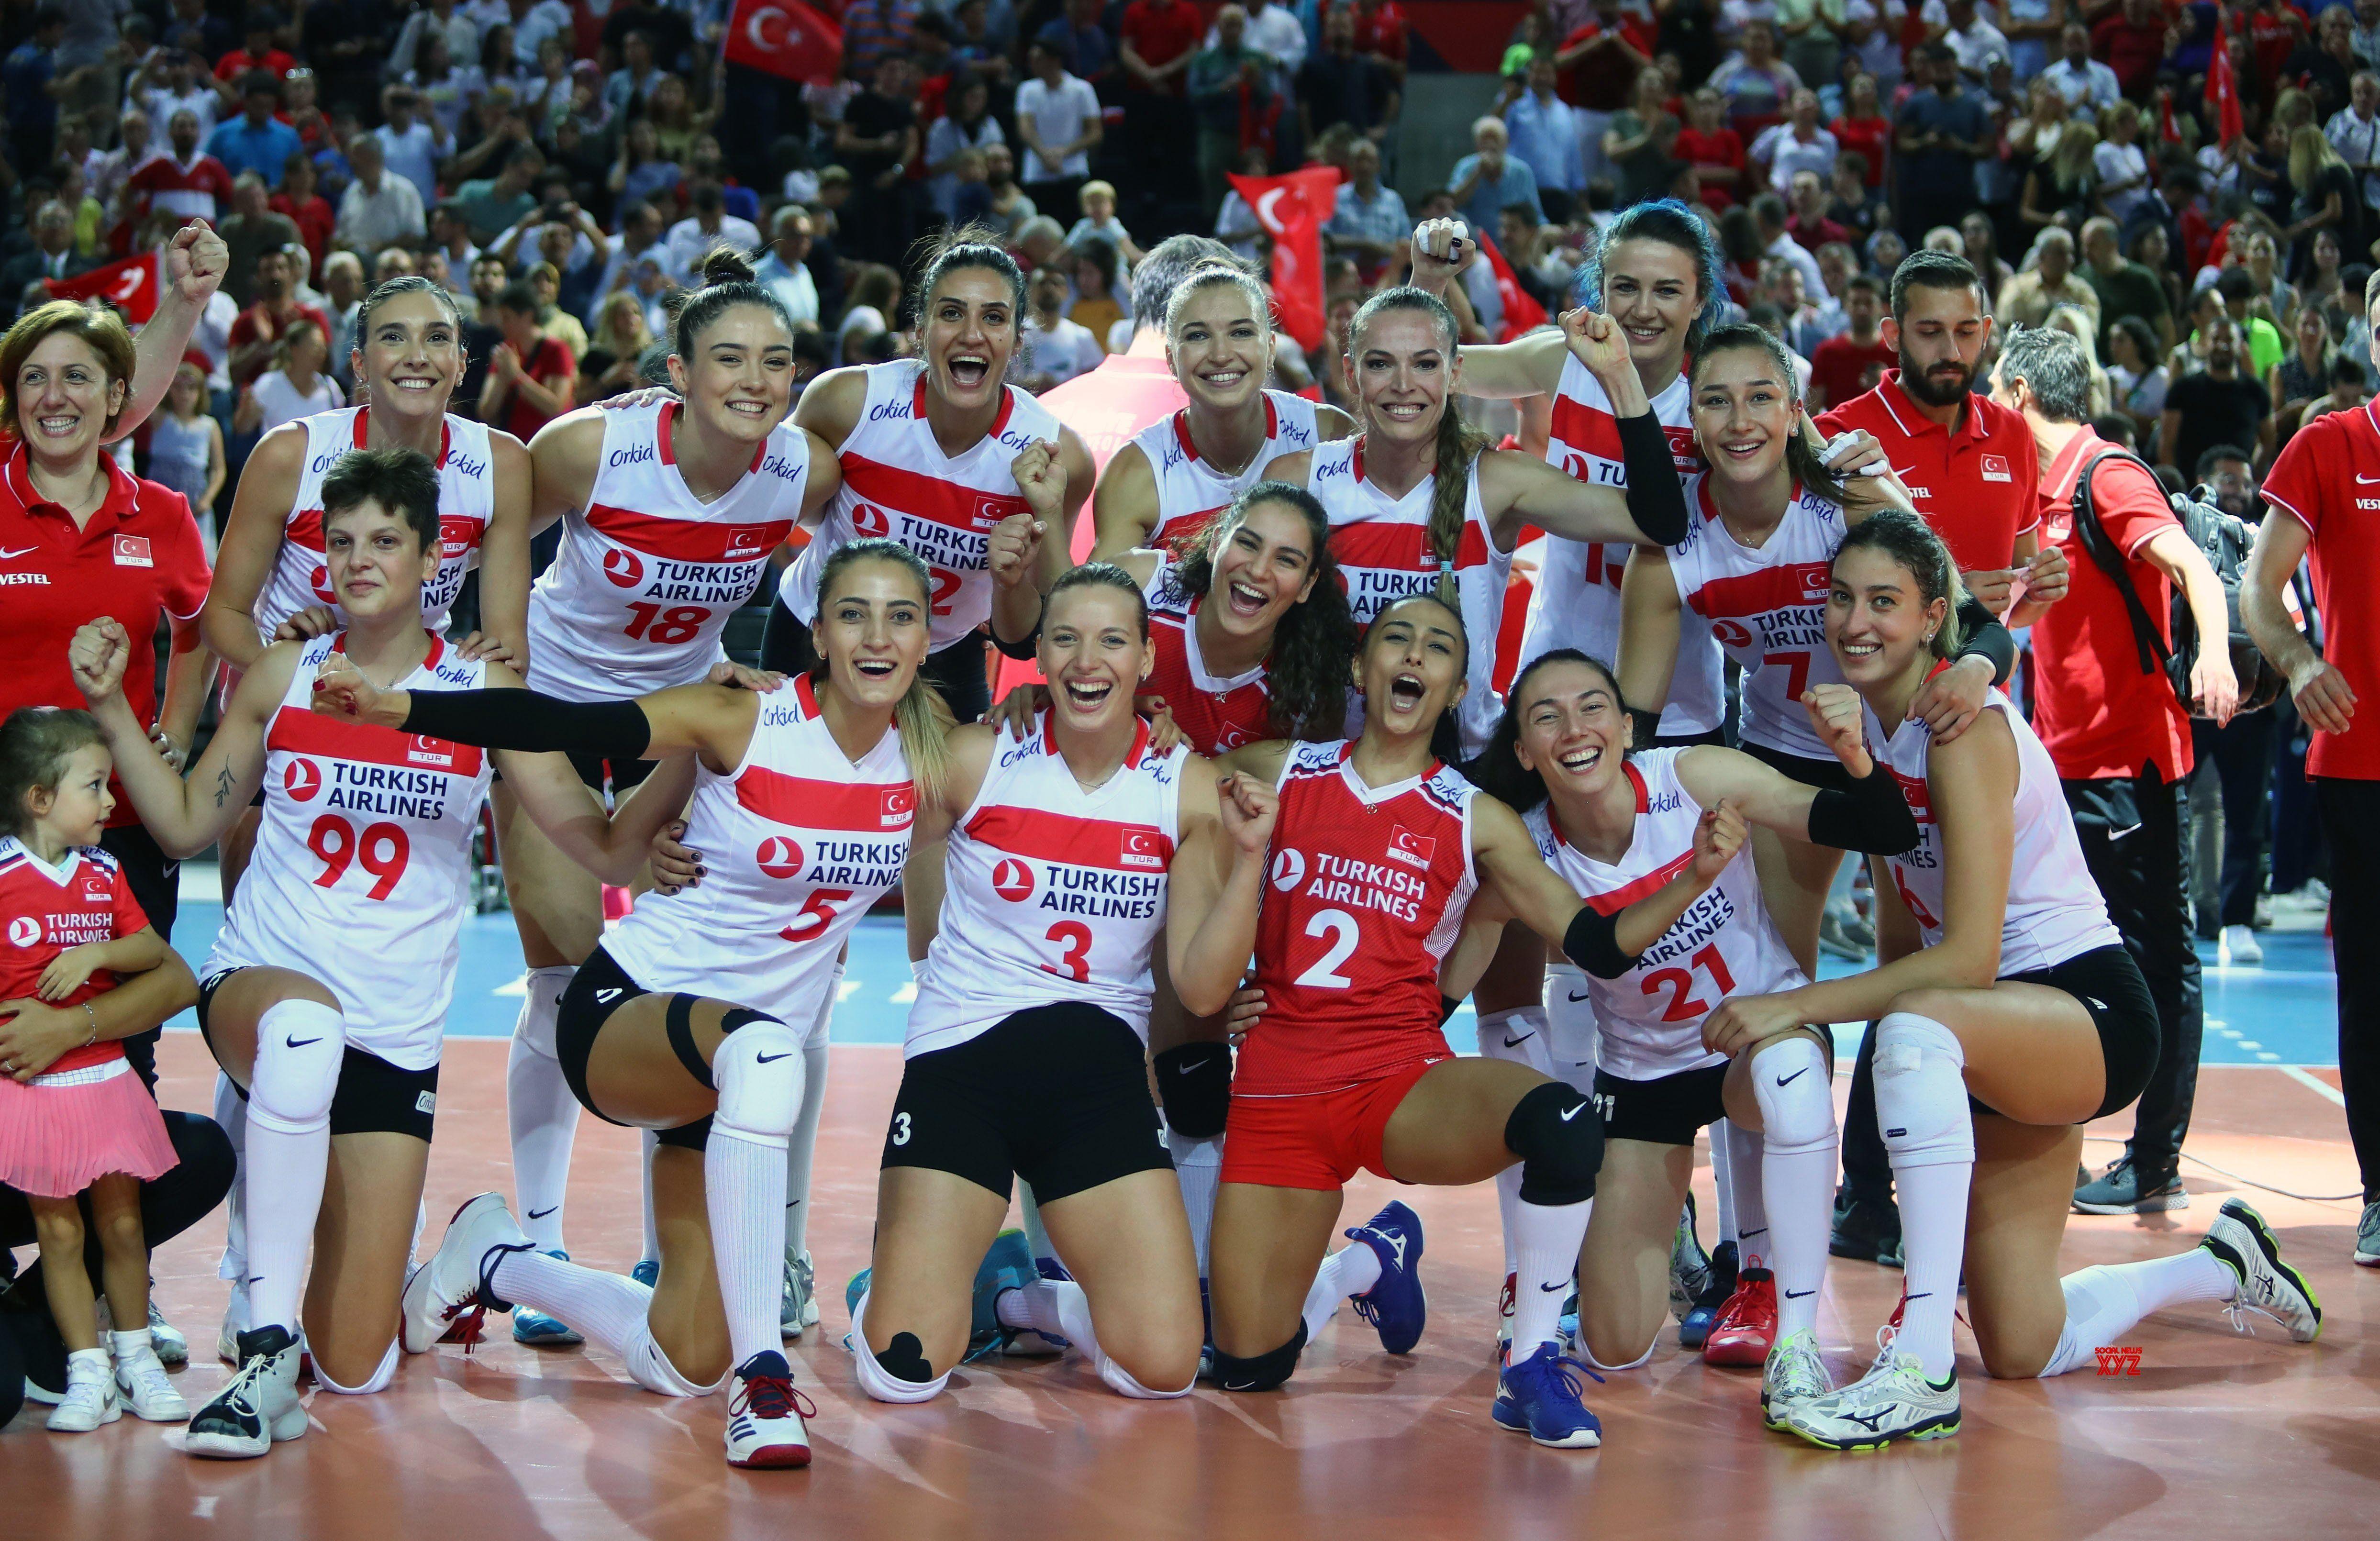 Turkey Ankara Volleyball Women S European Championship Gallery Women Volleyball European Championships